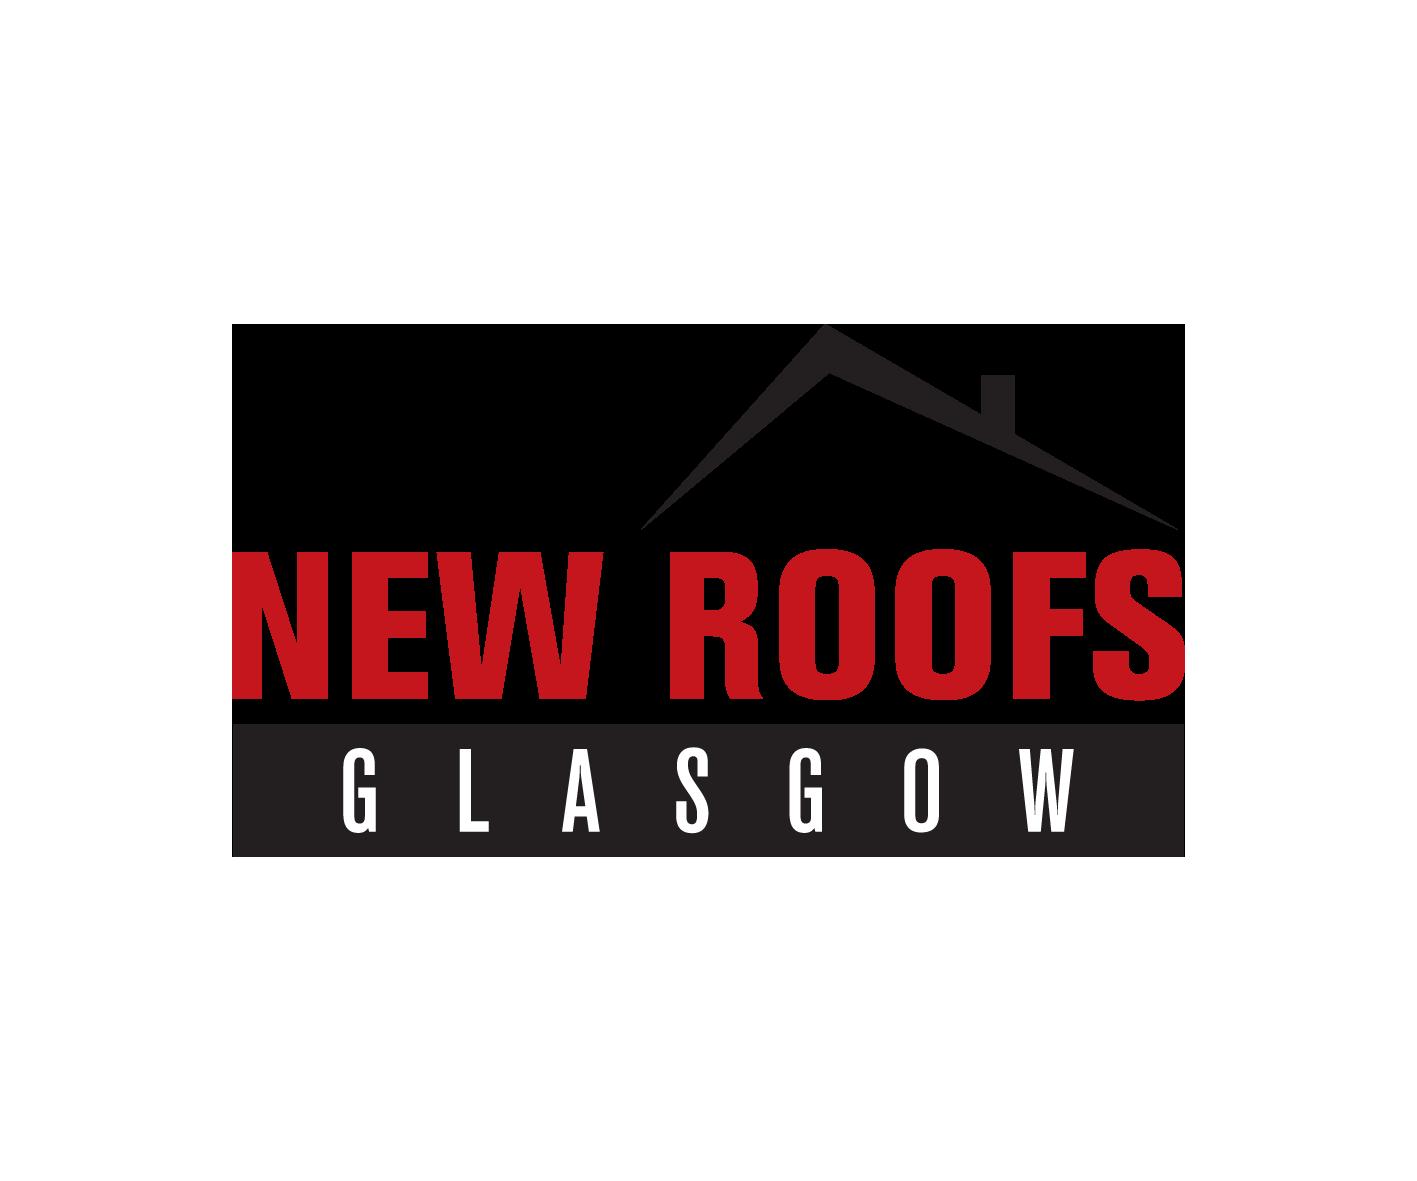 New Roofs Glasgow